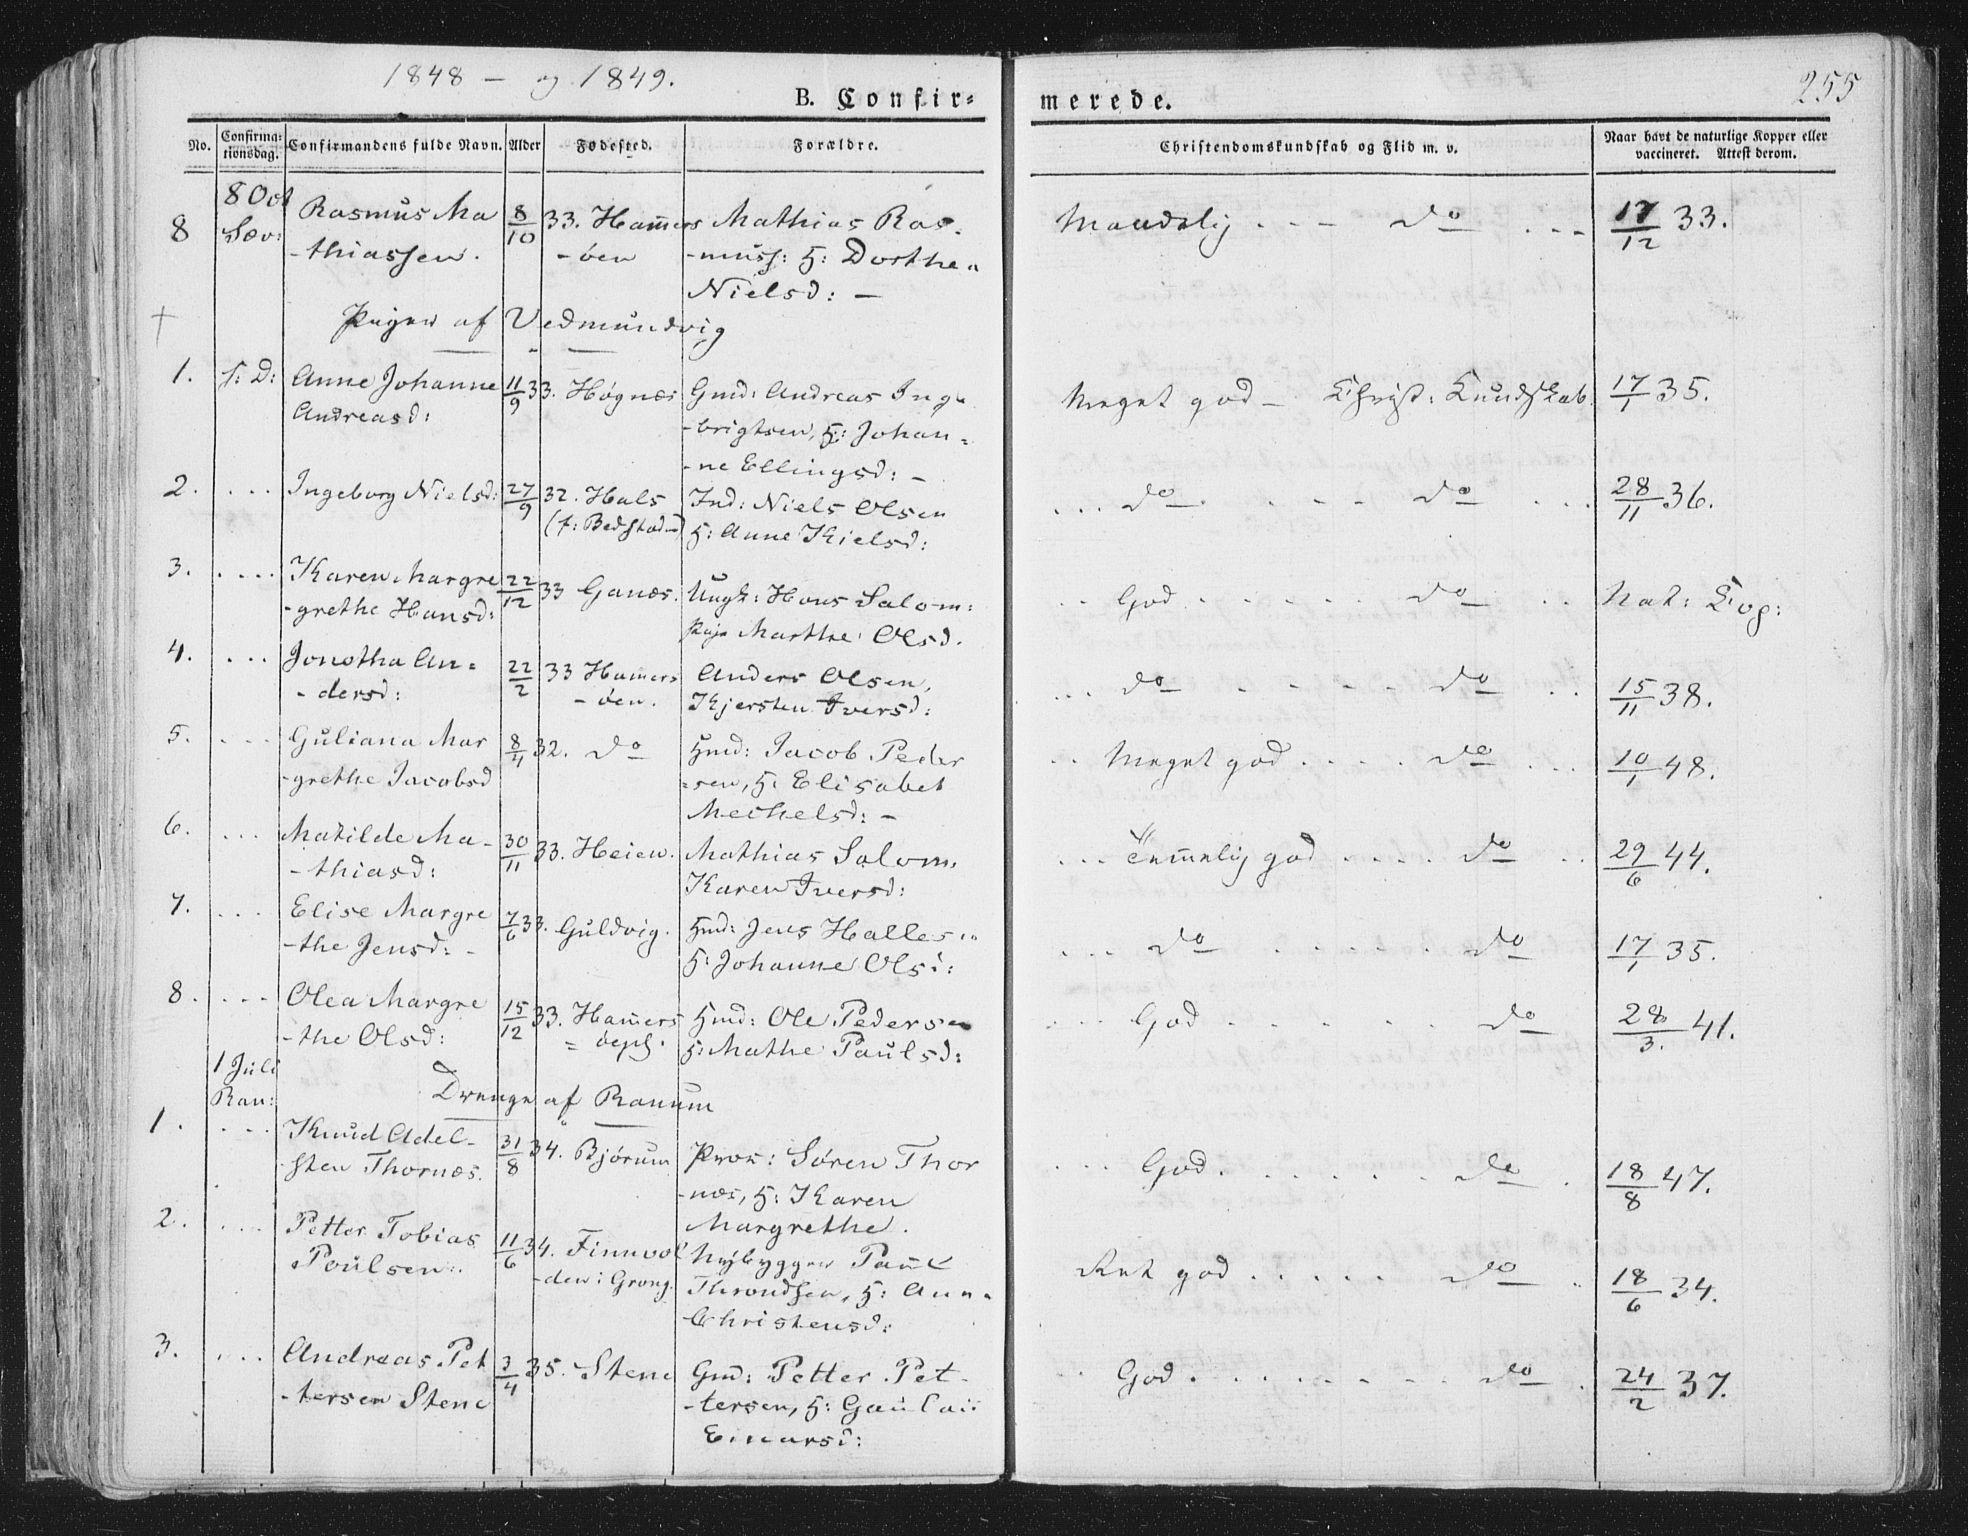 SAT, Ministerialprotokoller, klokkerbøker og fødselsregistre - Nord-Trøndelag, 764/L0551: Ministerialbok nr. 764A07a, 1824-1864, s. 255